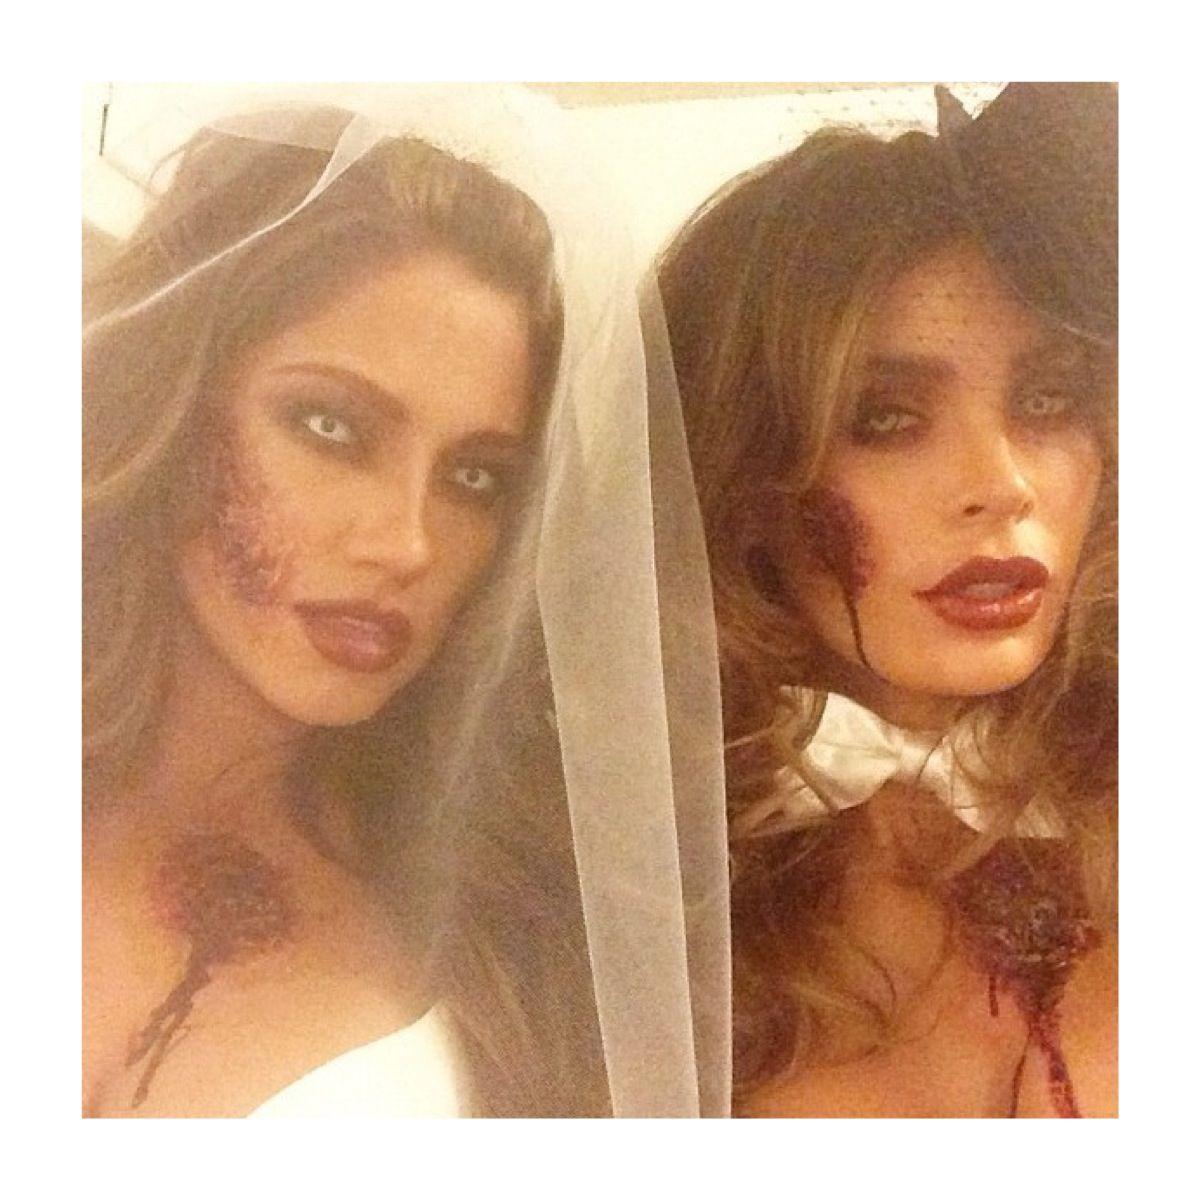 Zombie bride costume idea for halloween if i do something